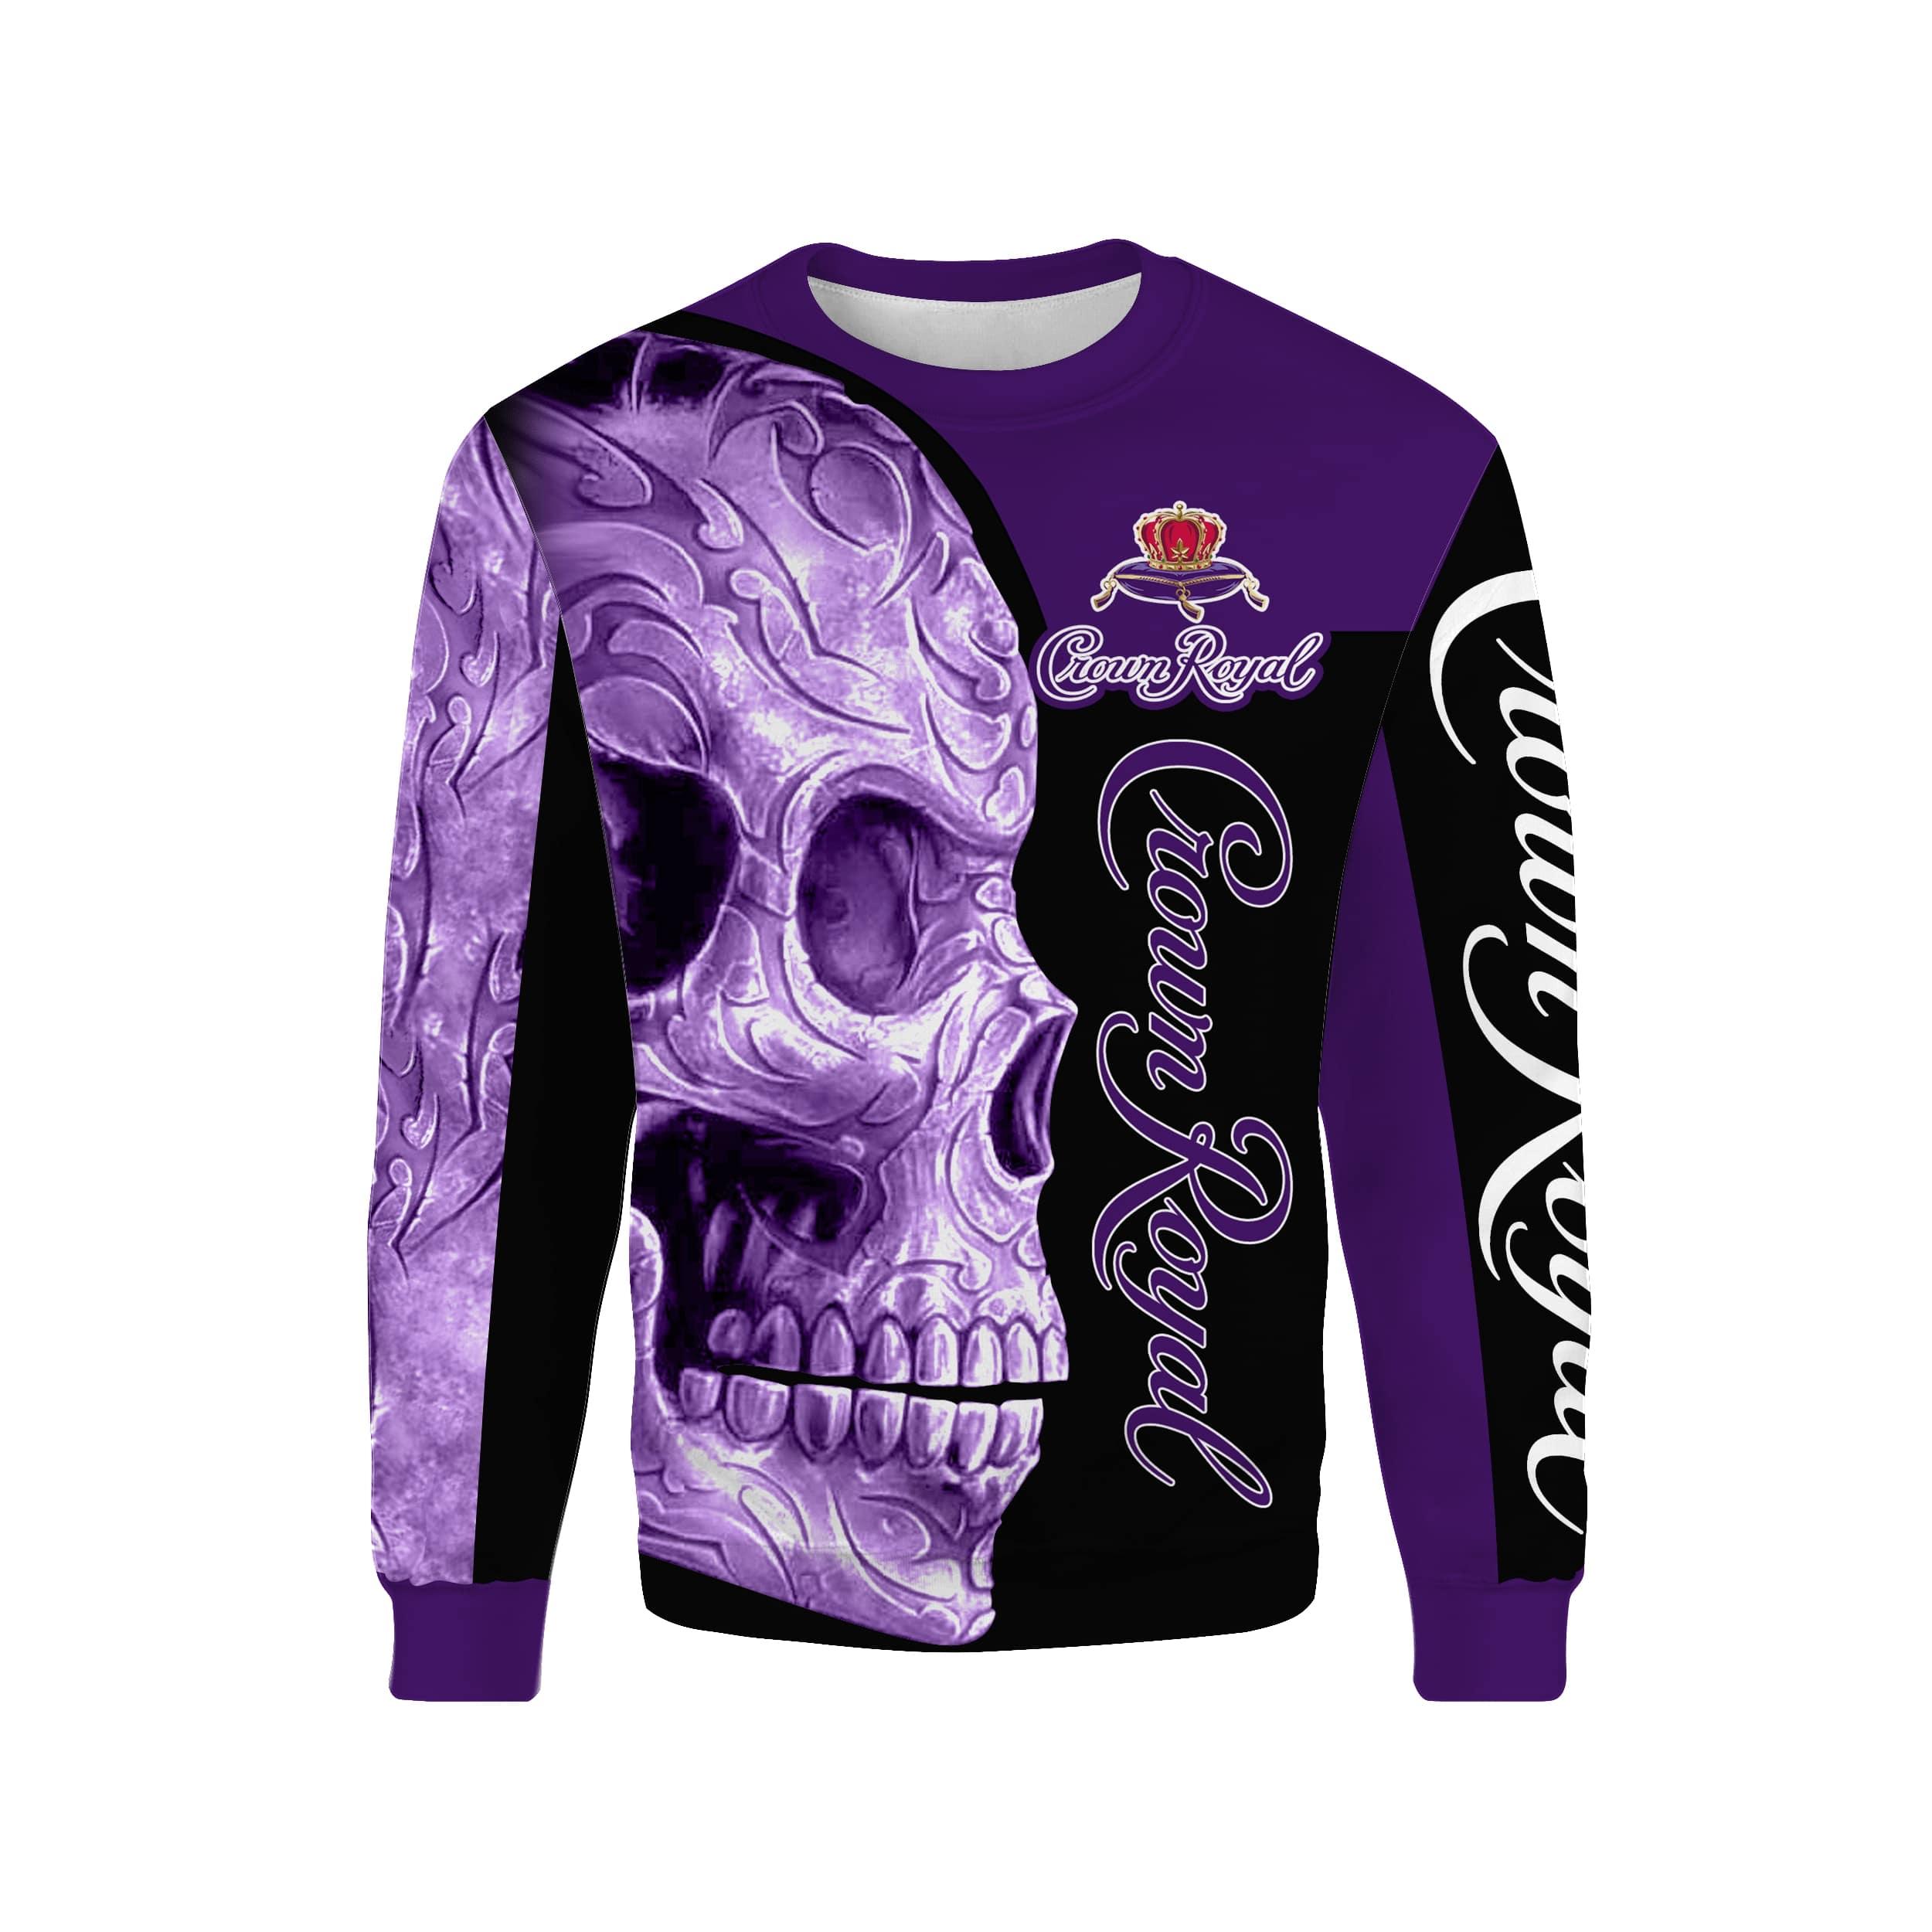 Skull Crown Royal all over print sweatshirt